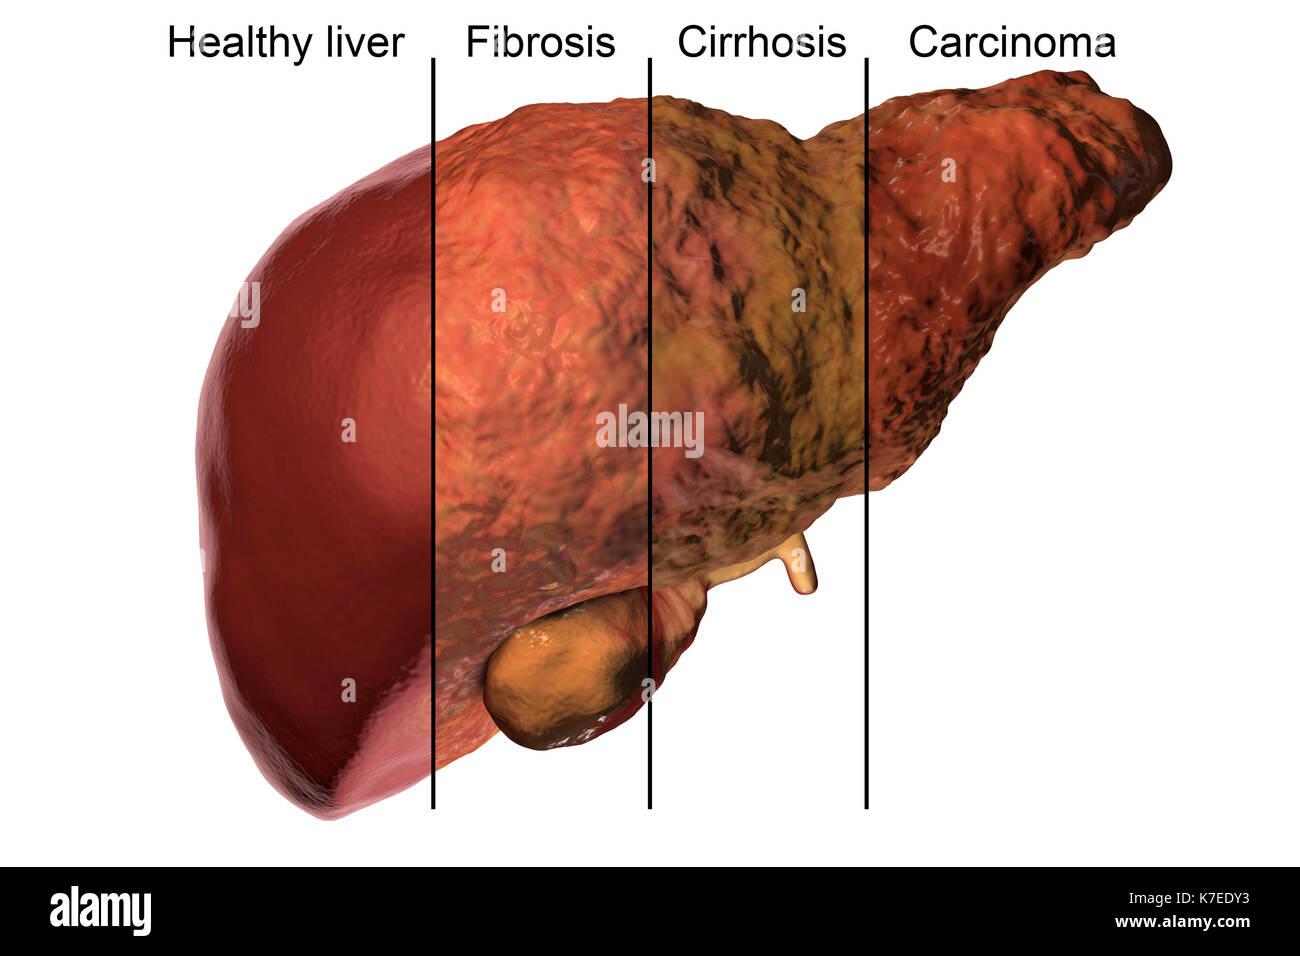 Liver Disease Stock Photos & Liver Disease Stock Images - Alamy